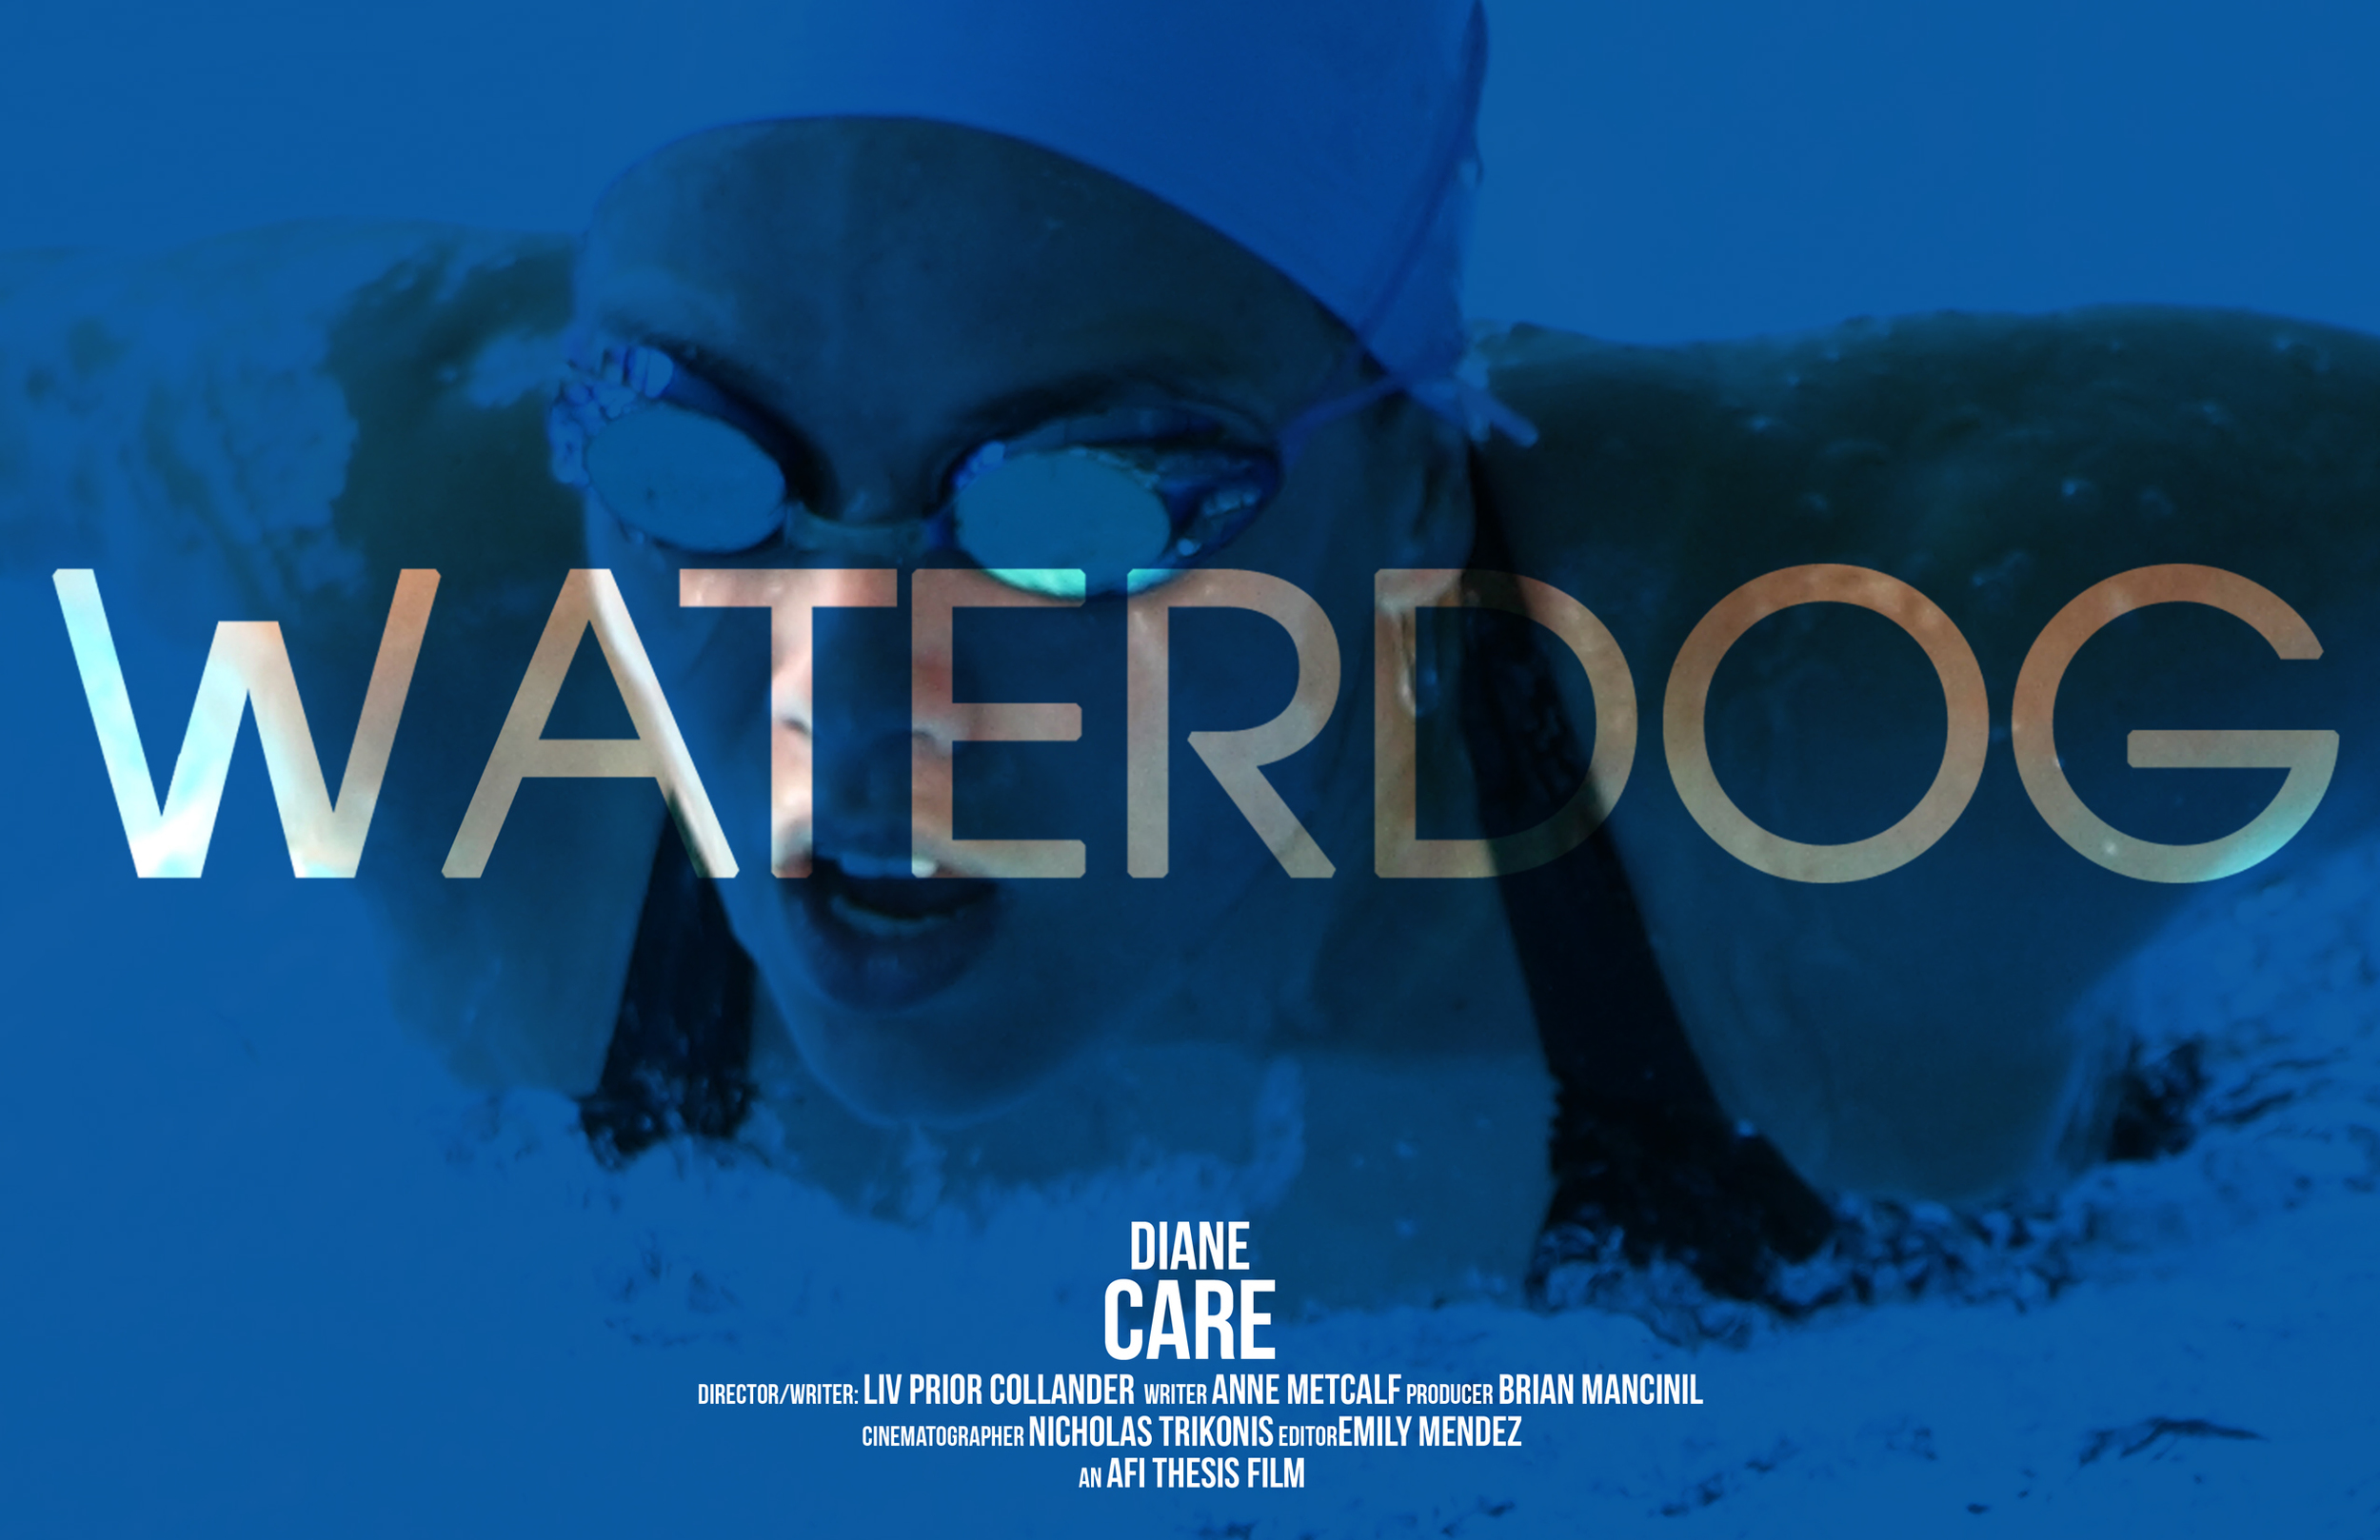 Waterdog poster2.jpg